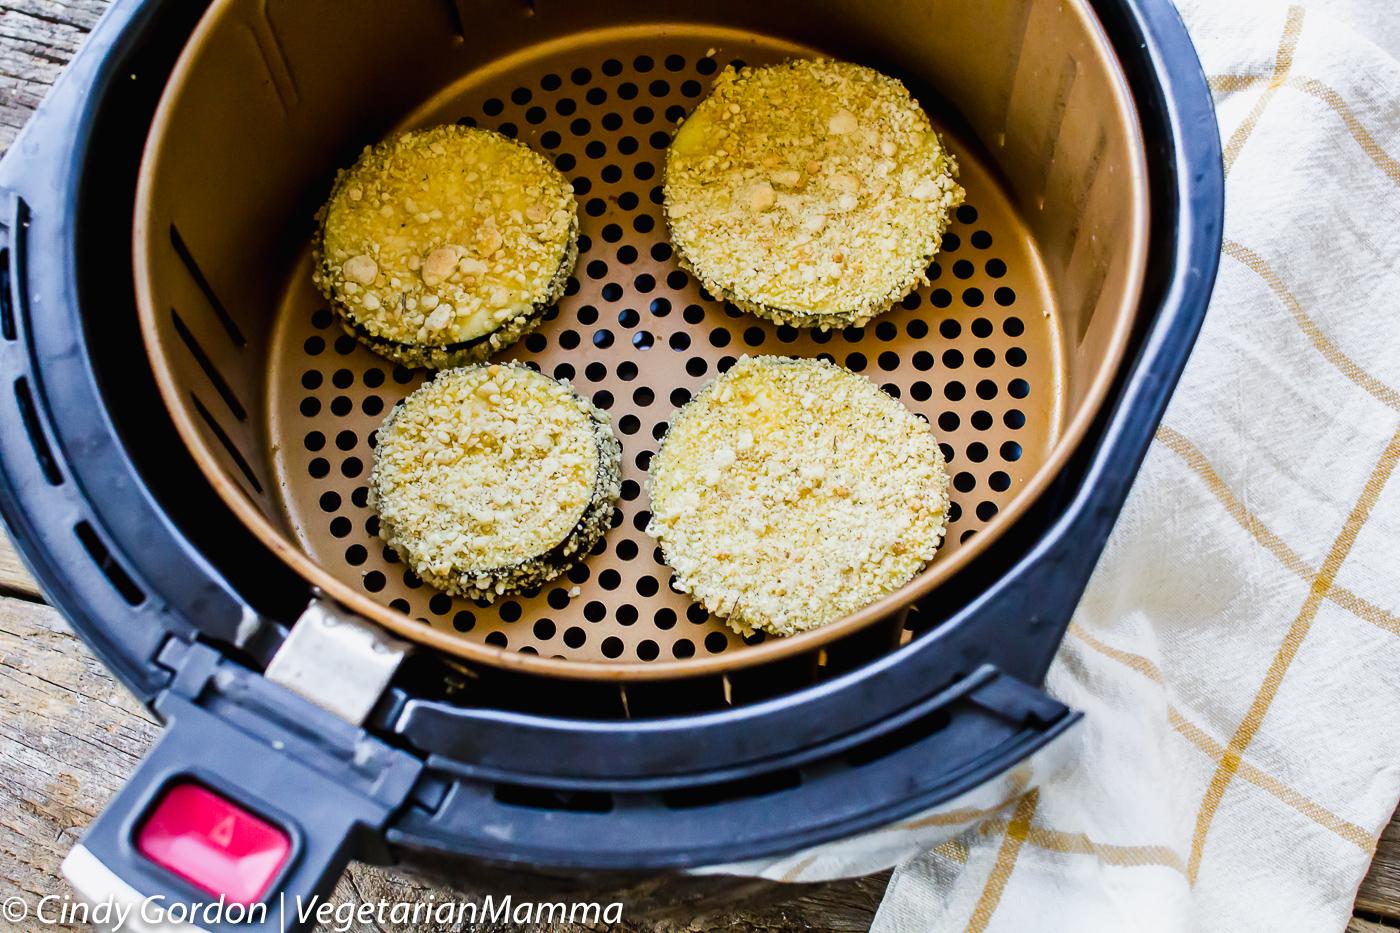 Air Fryer Gluten Free Eggplant Parmesan shown in air fryer basket.